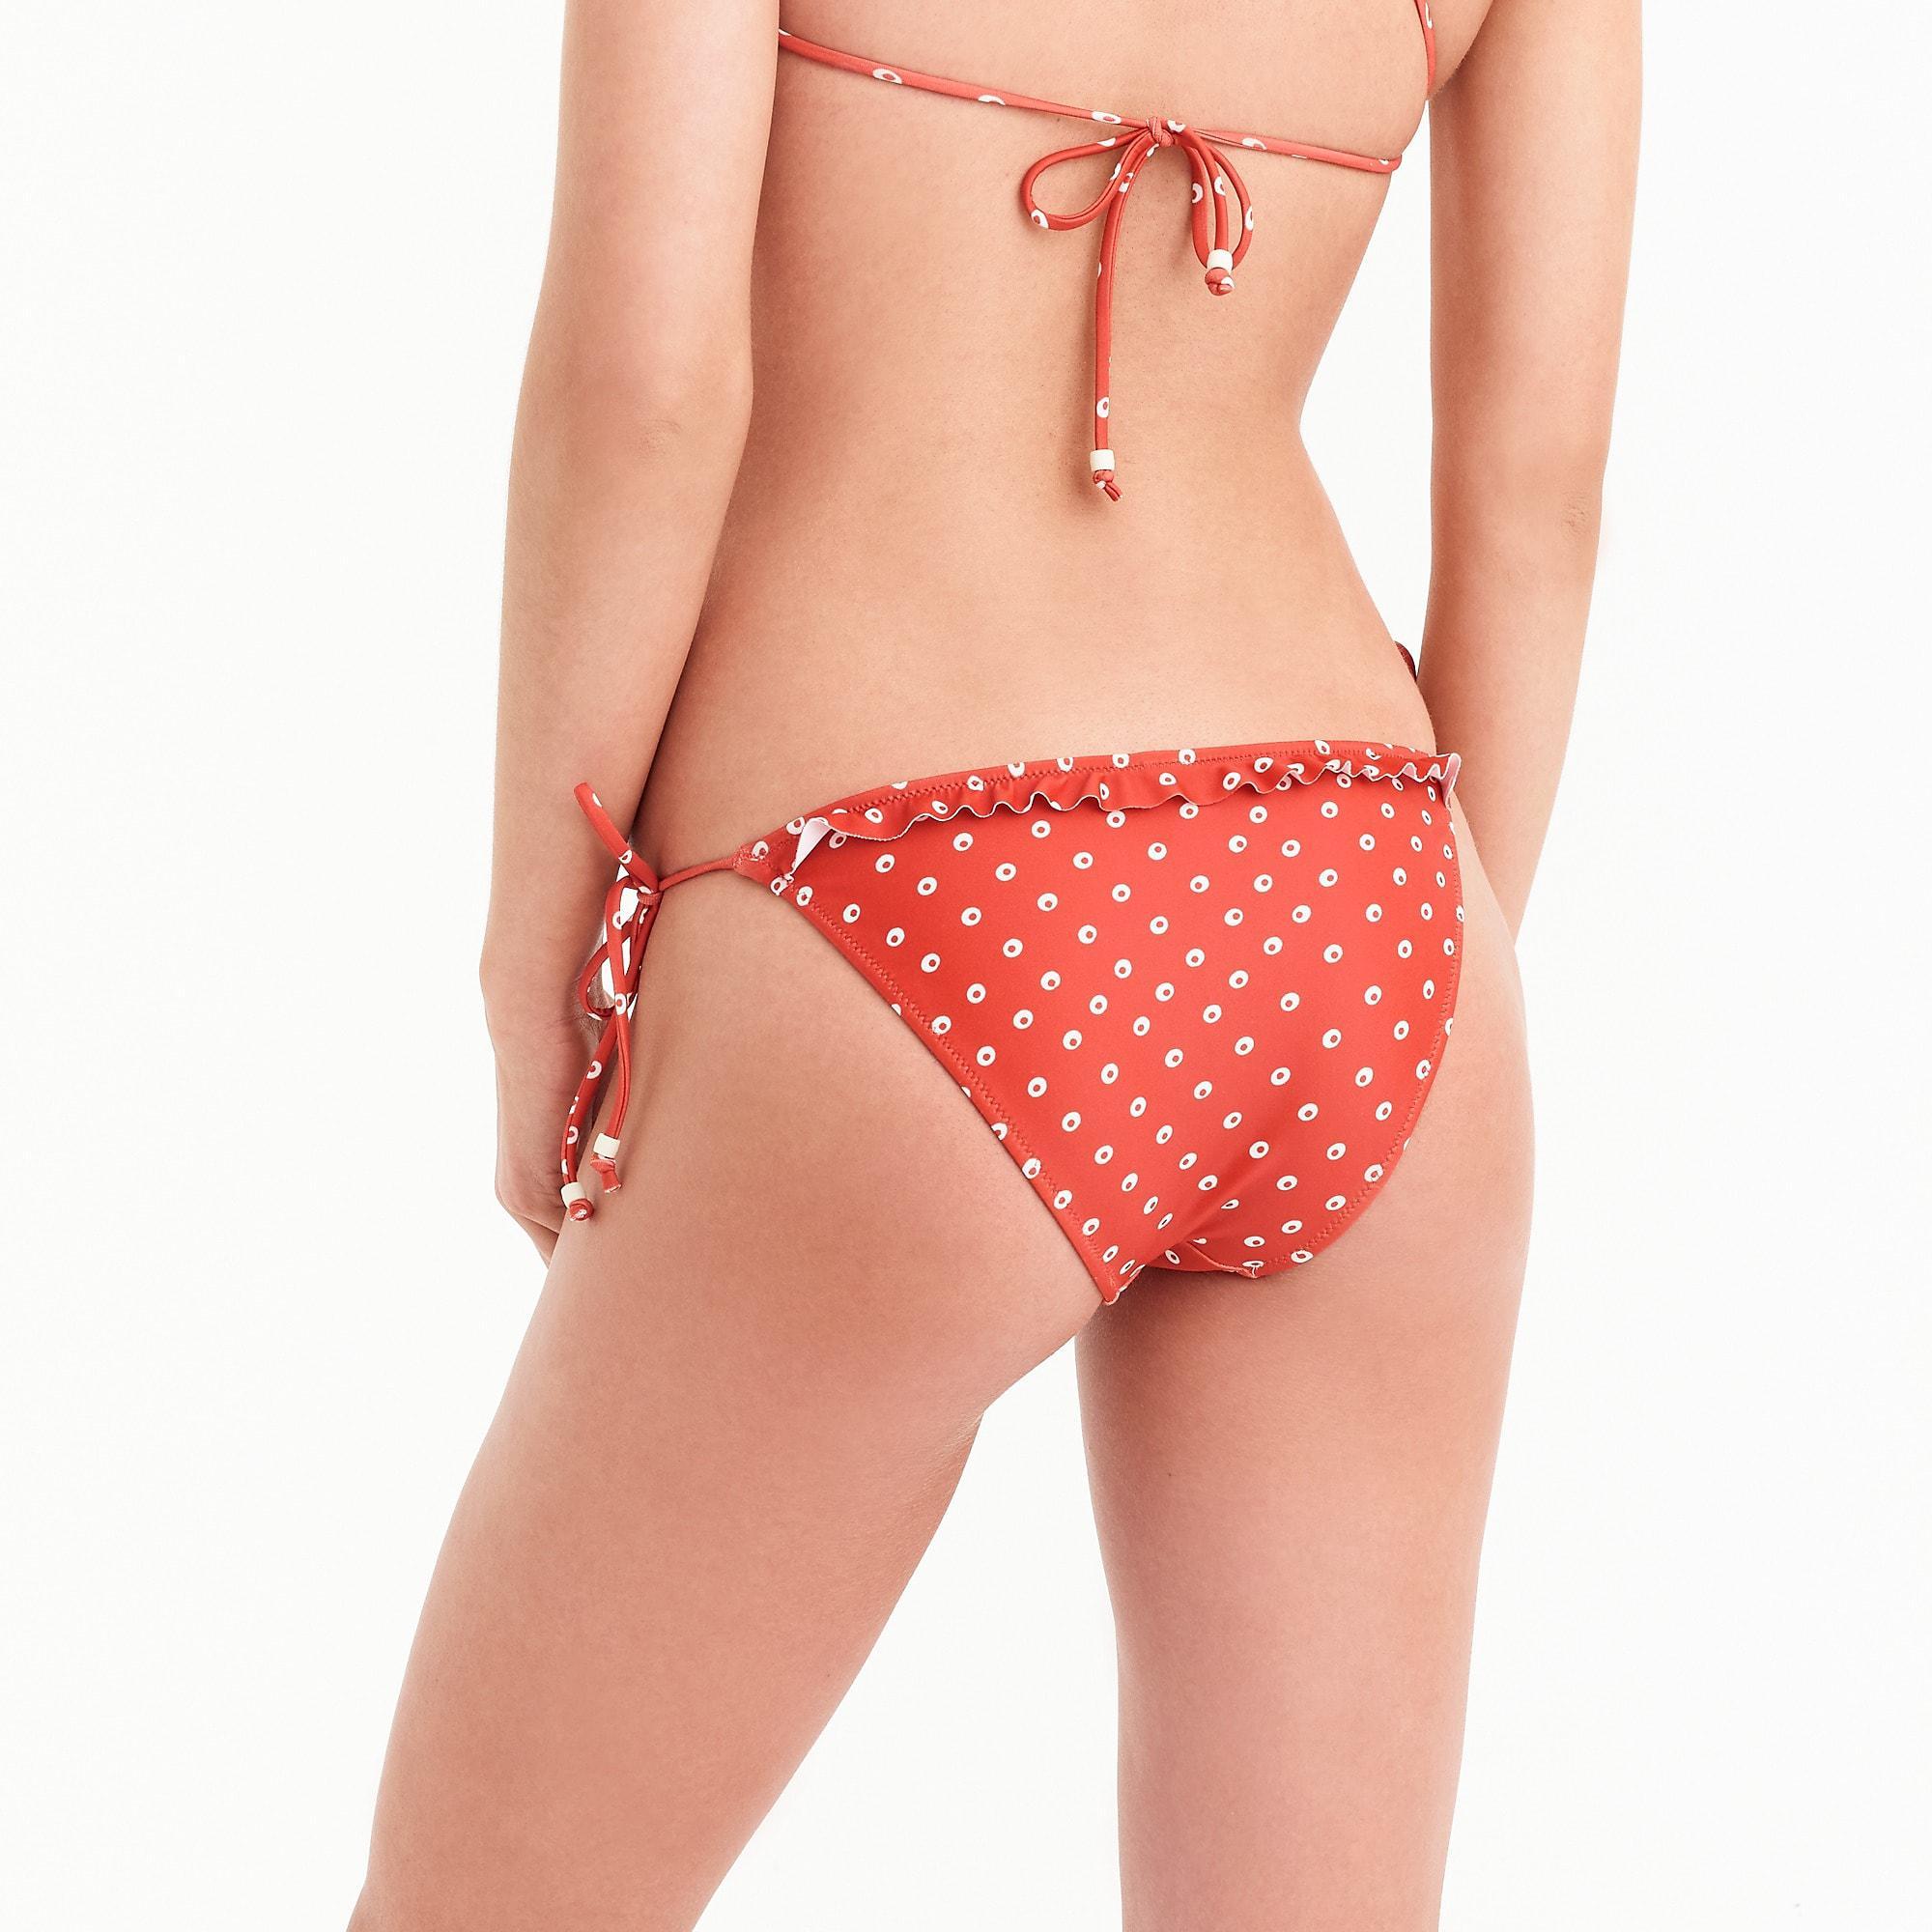 0233ea13e2 Lyst - J.Crew Playa Printed Maui Ruffle Bikini Bottom